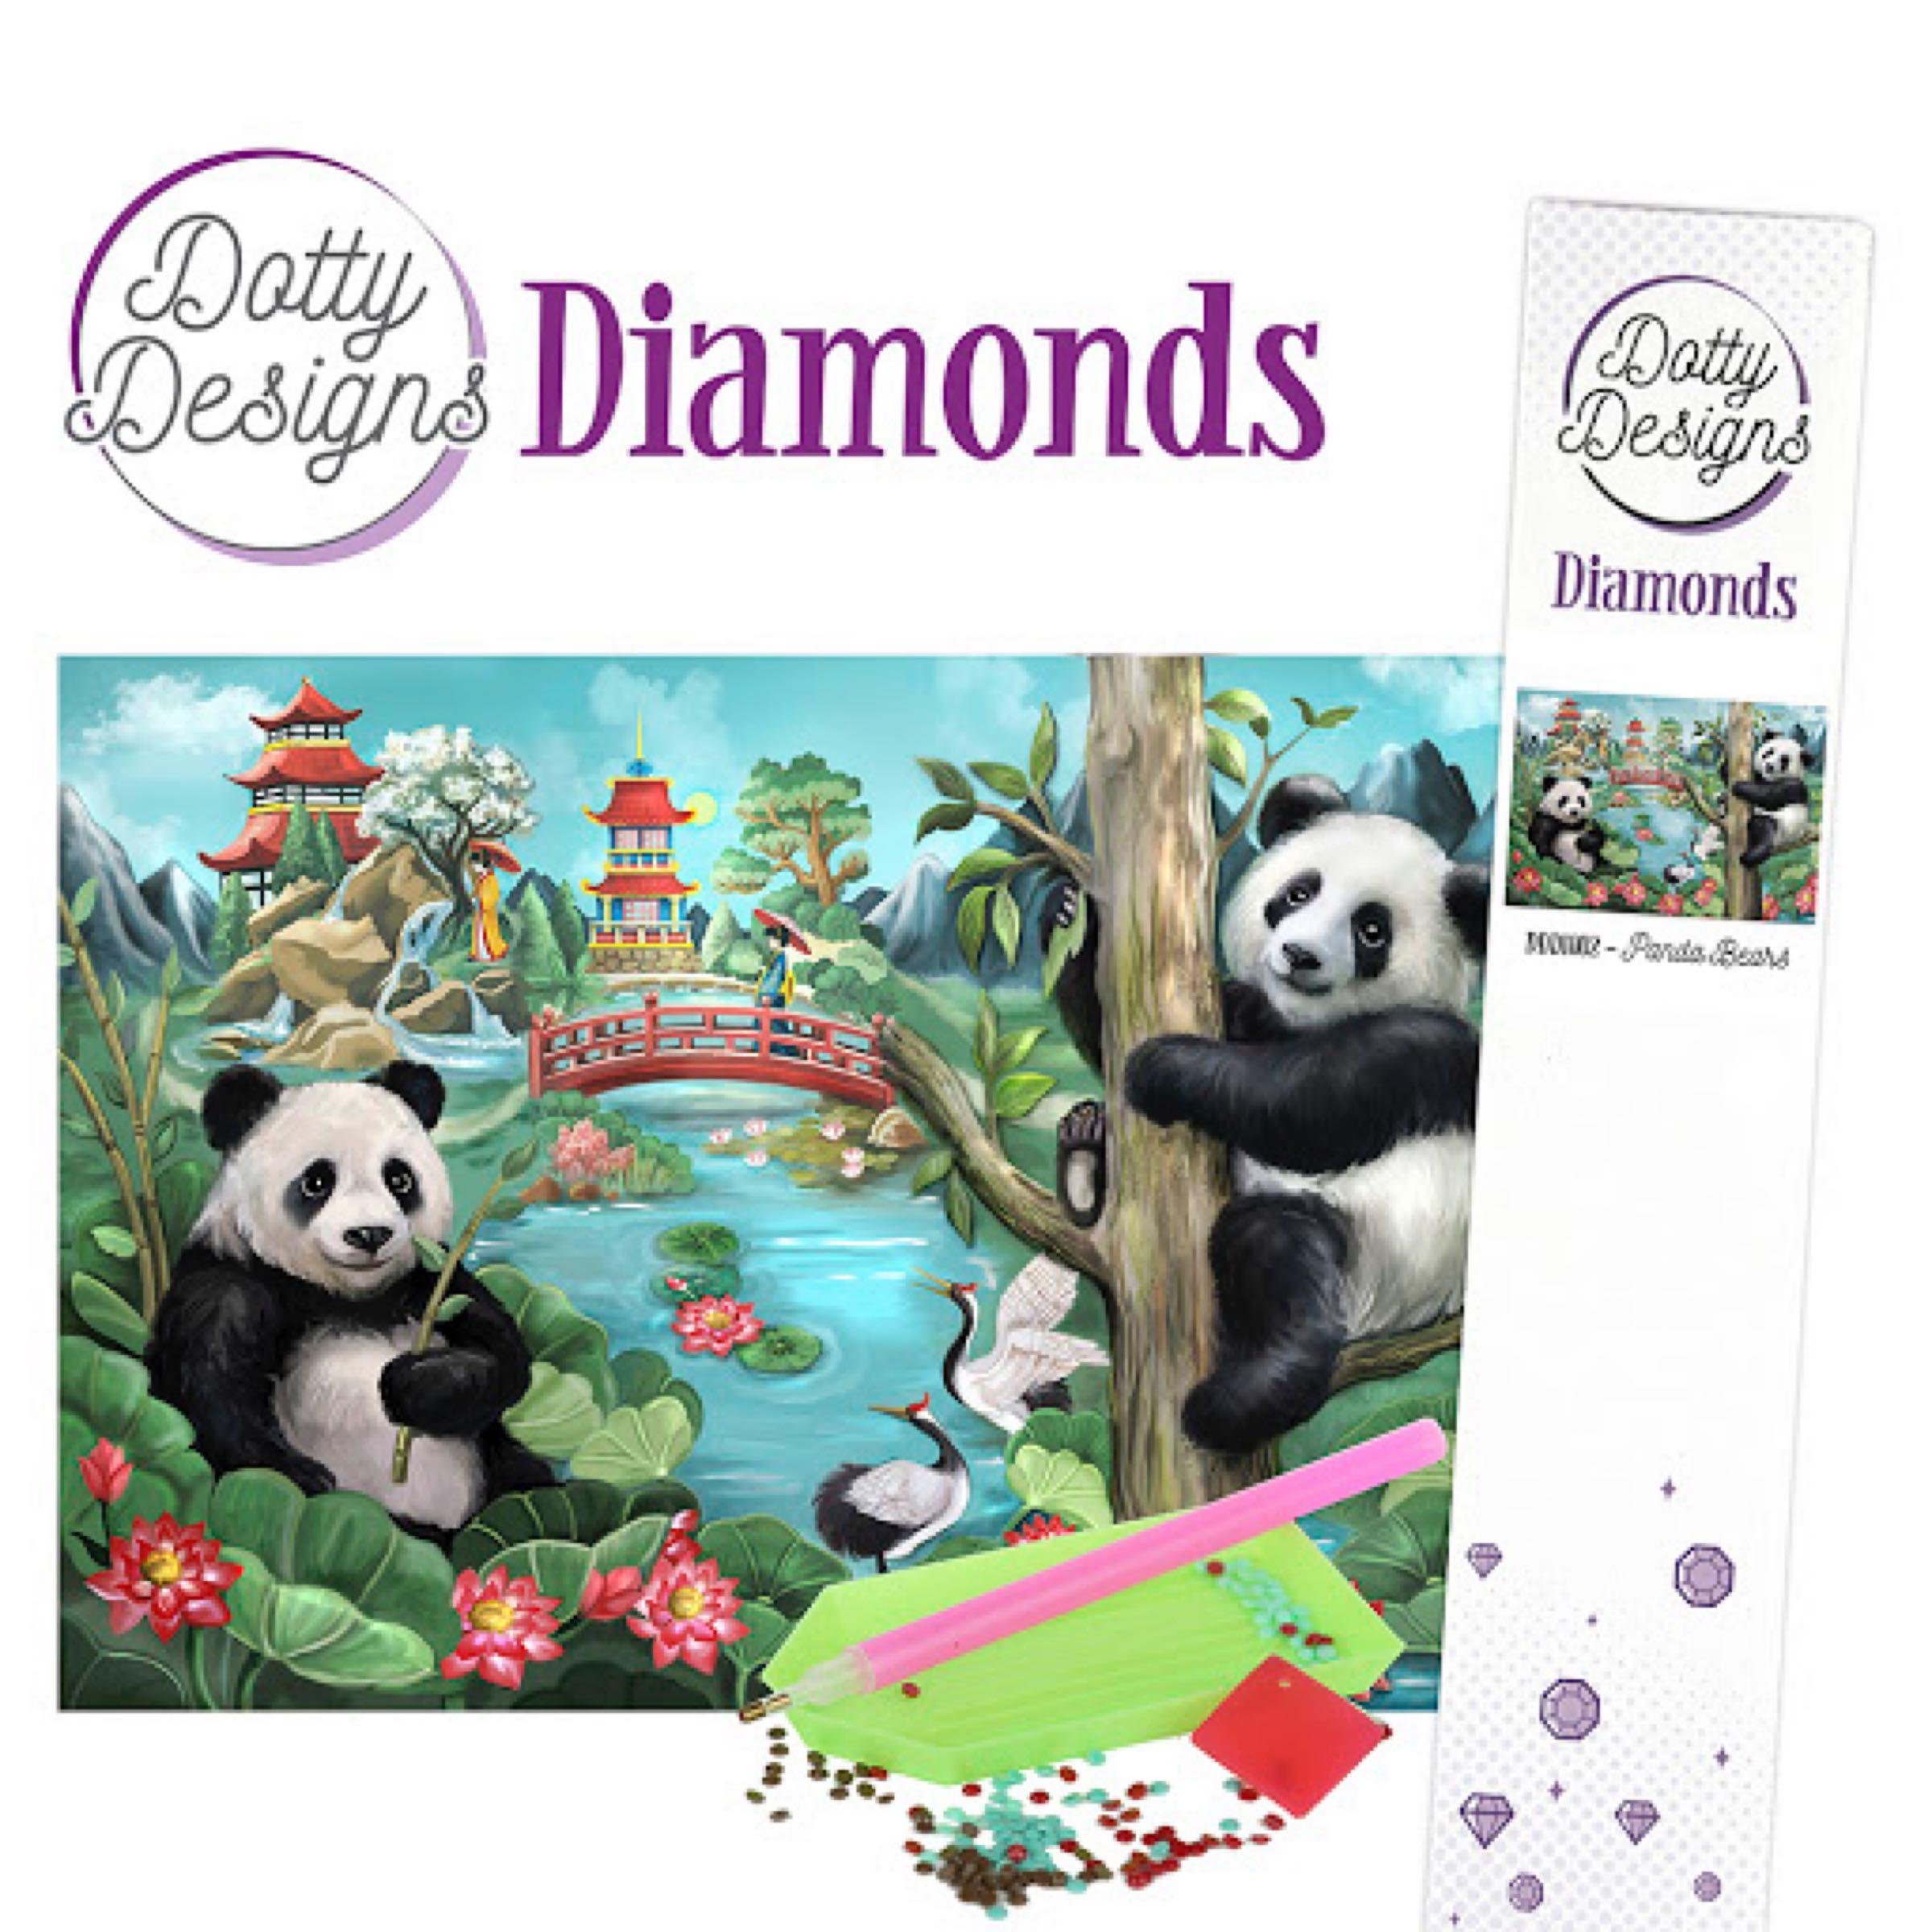 Dotty Design Dimonds - panda bear